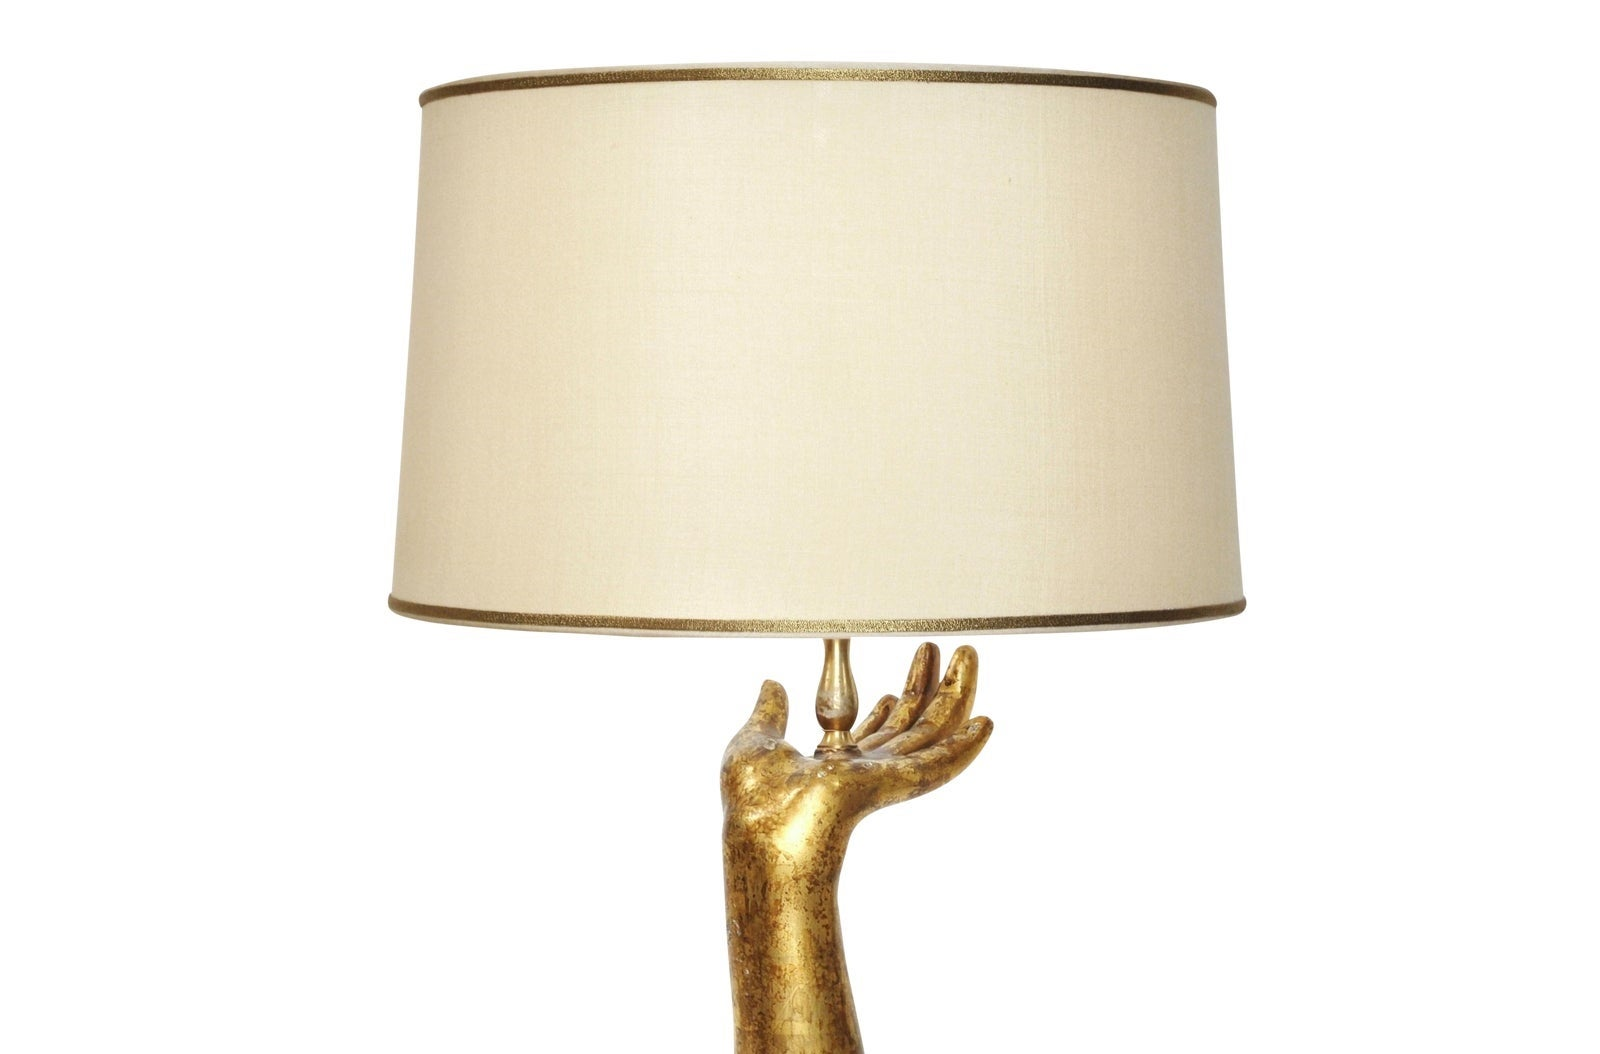 Designer Giltwood Table Lamp, Scandia